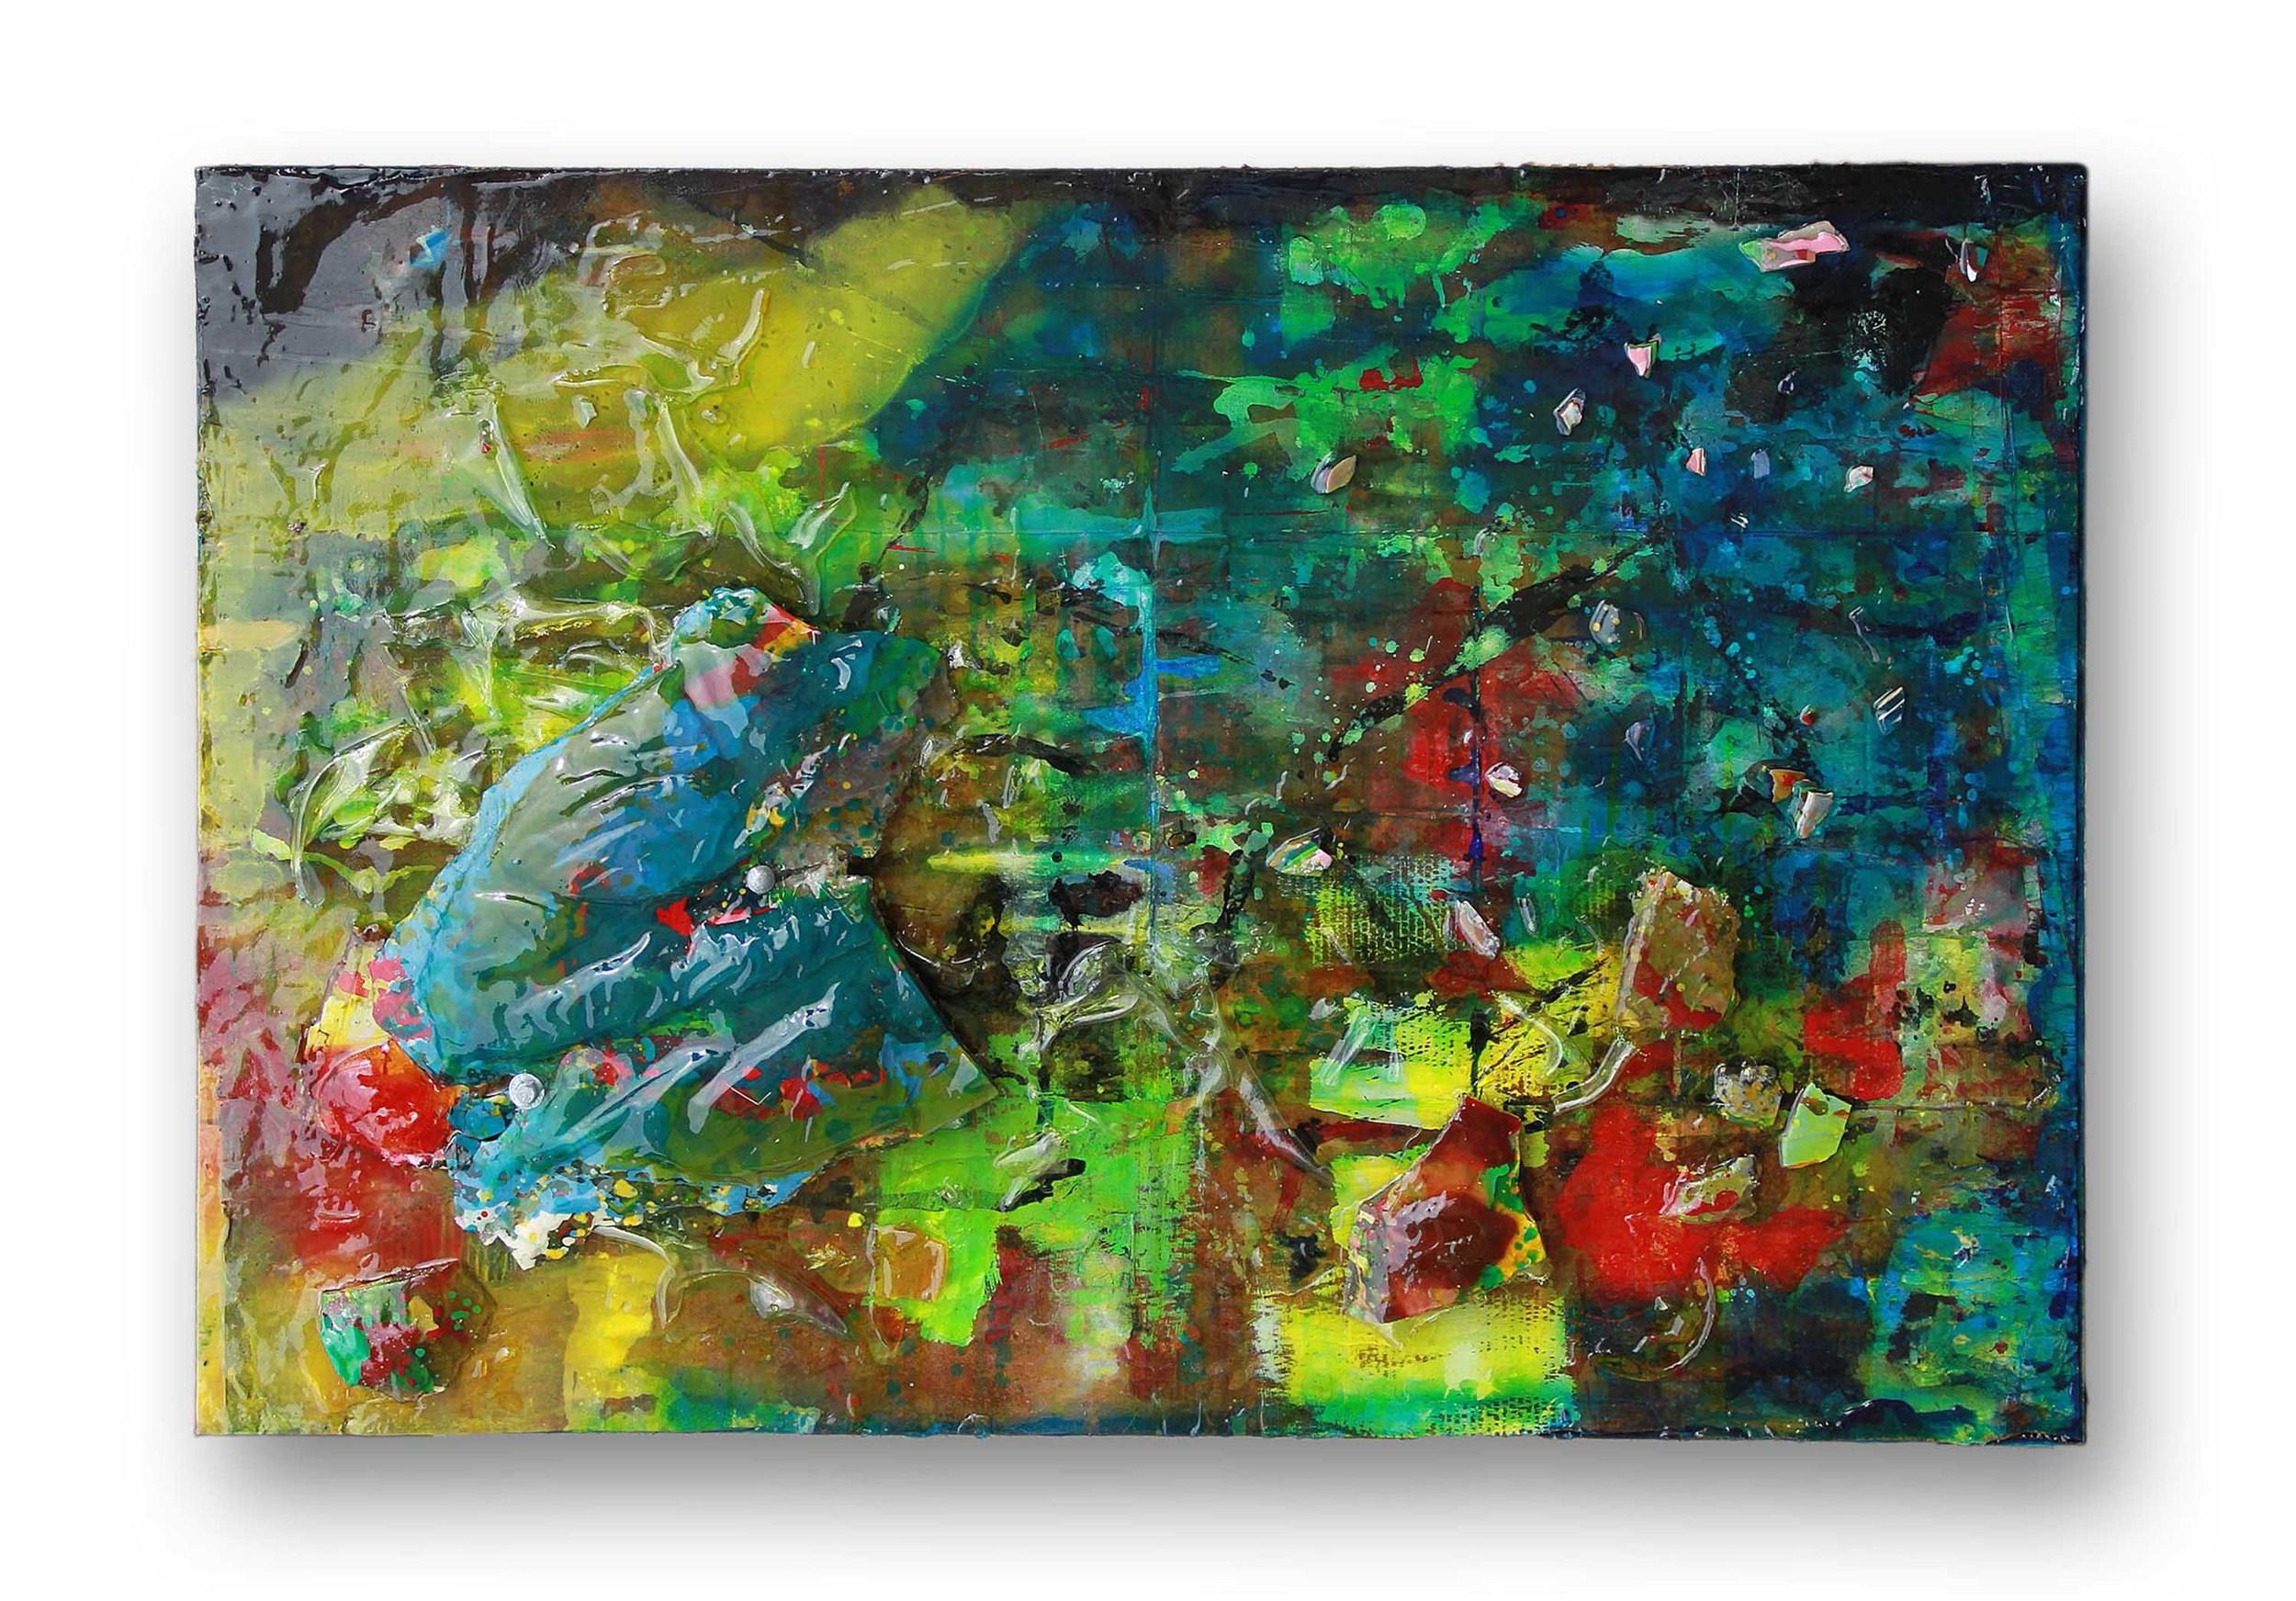 21 Resin Painting CC IMG_9049 03 LR.jpg